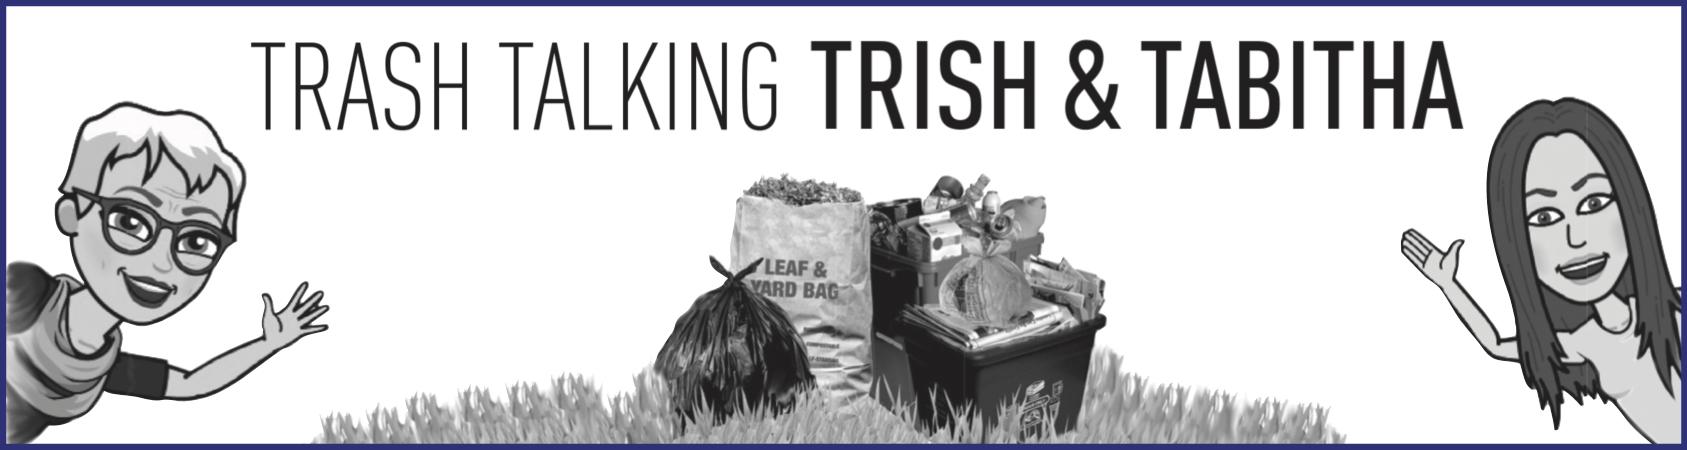 Trash Talking Trish & Tabitha Column Heading